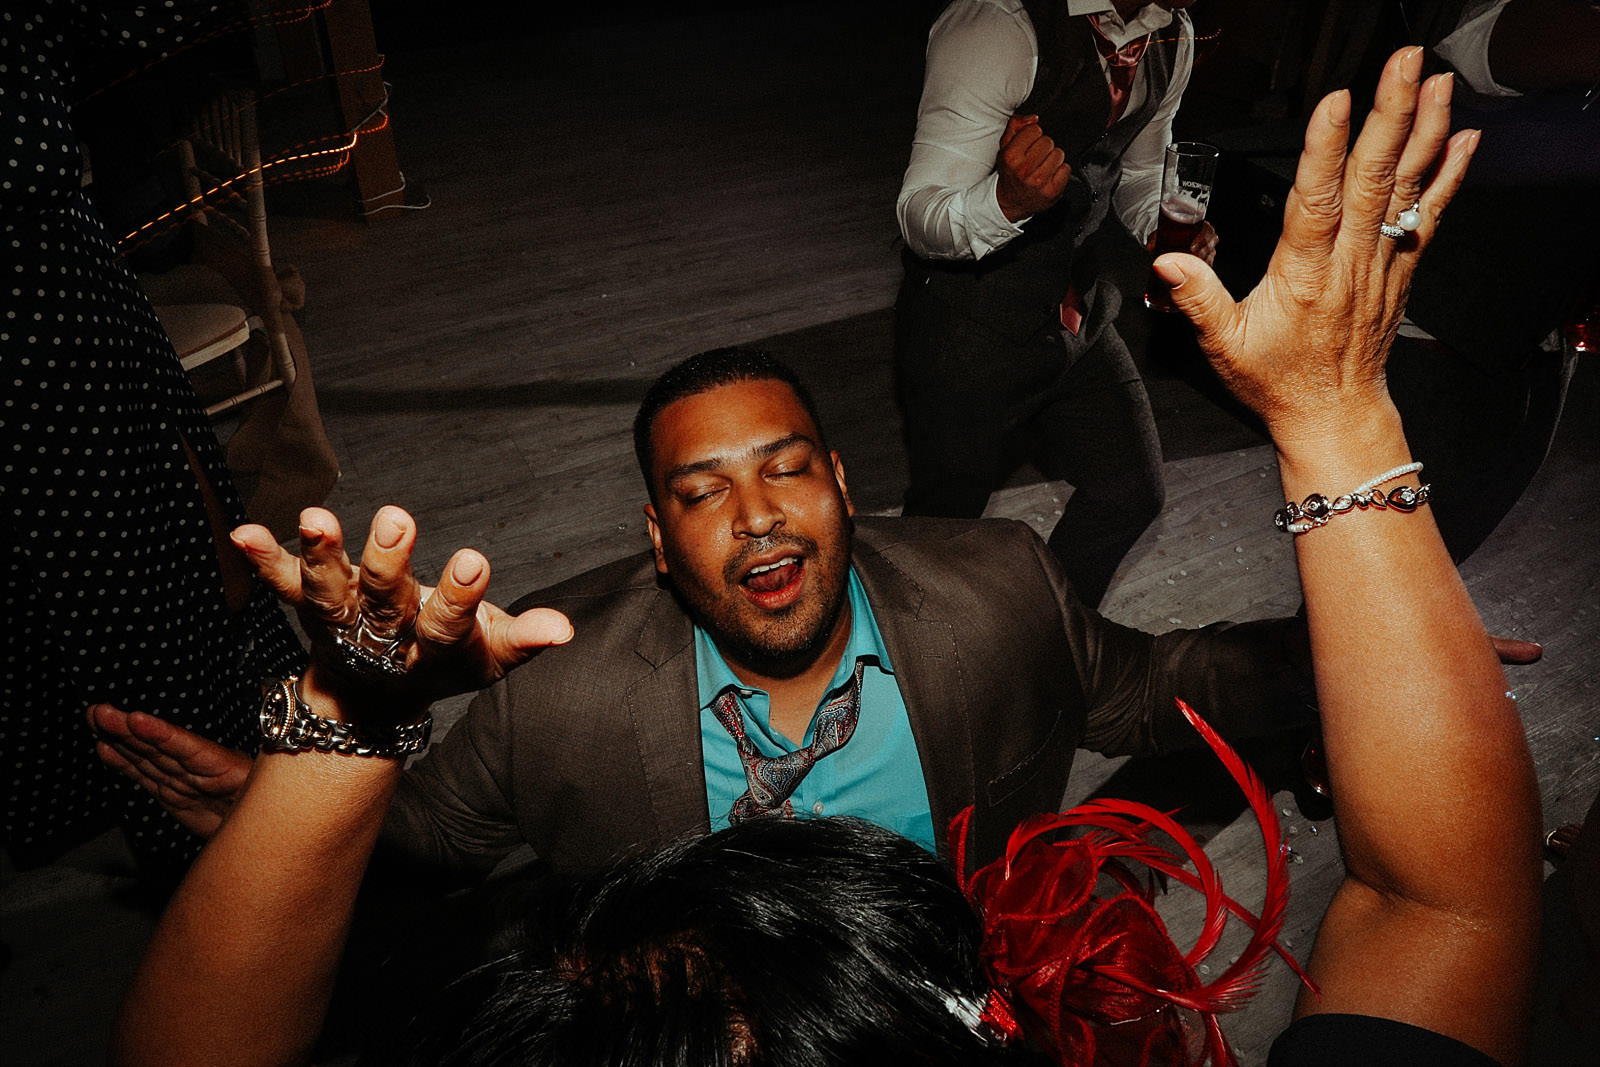 crazy man dancing at a wedding